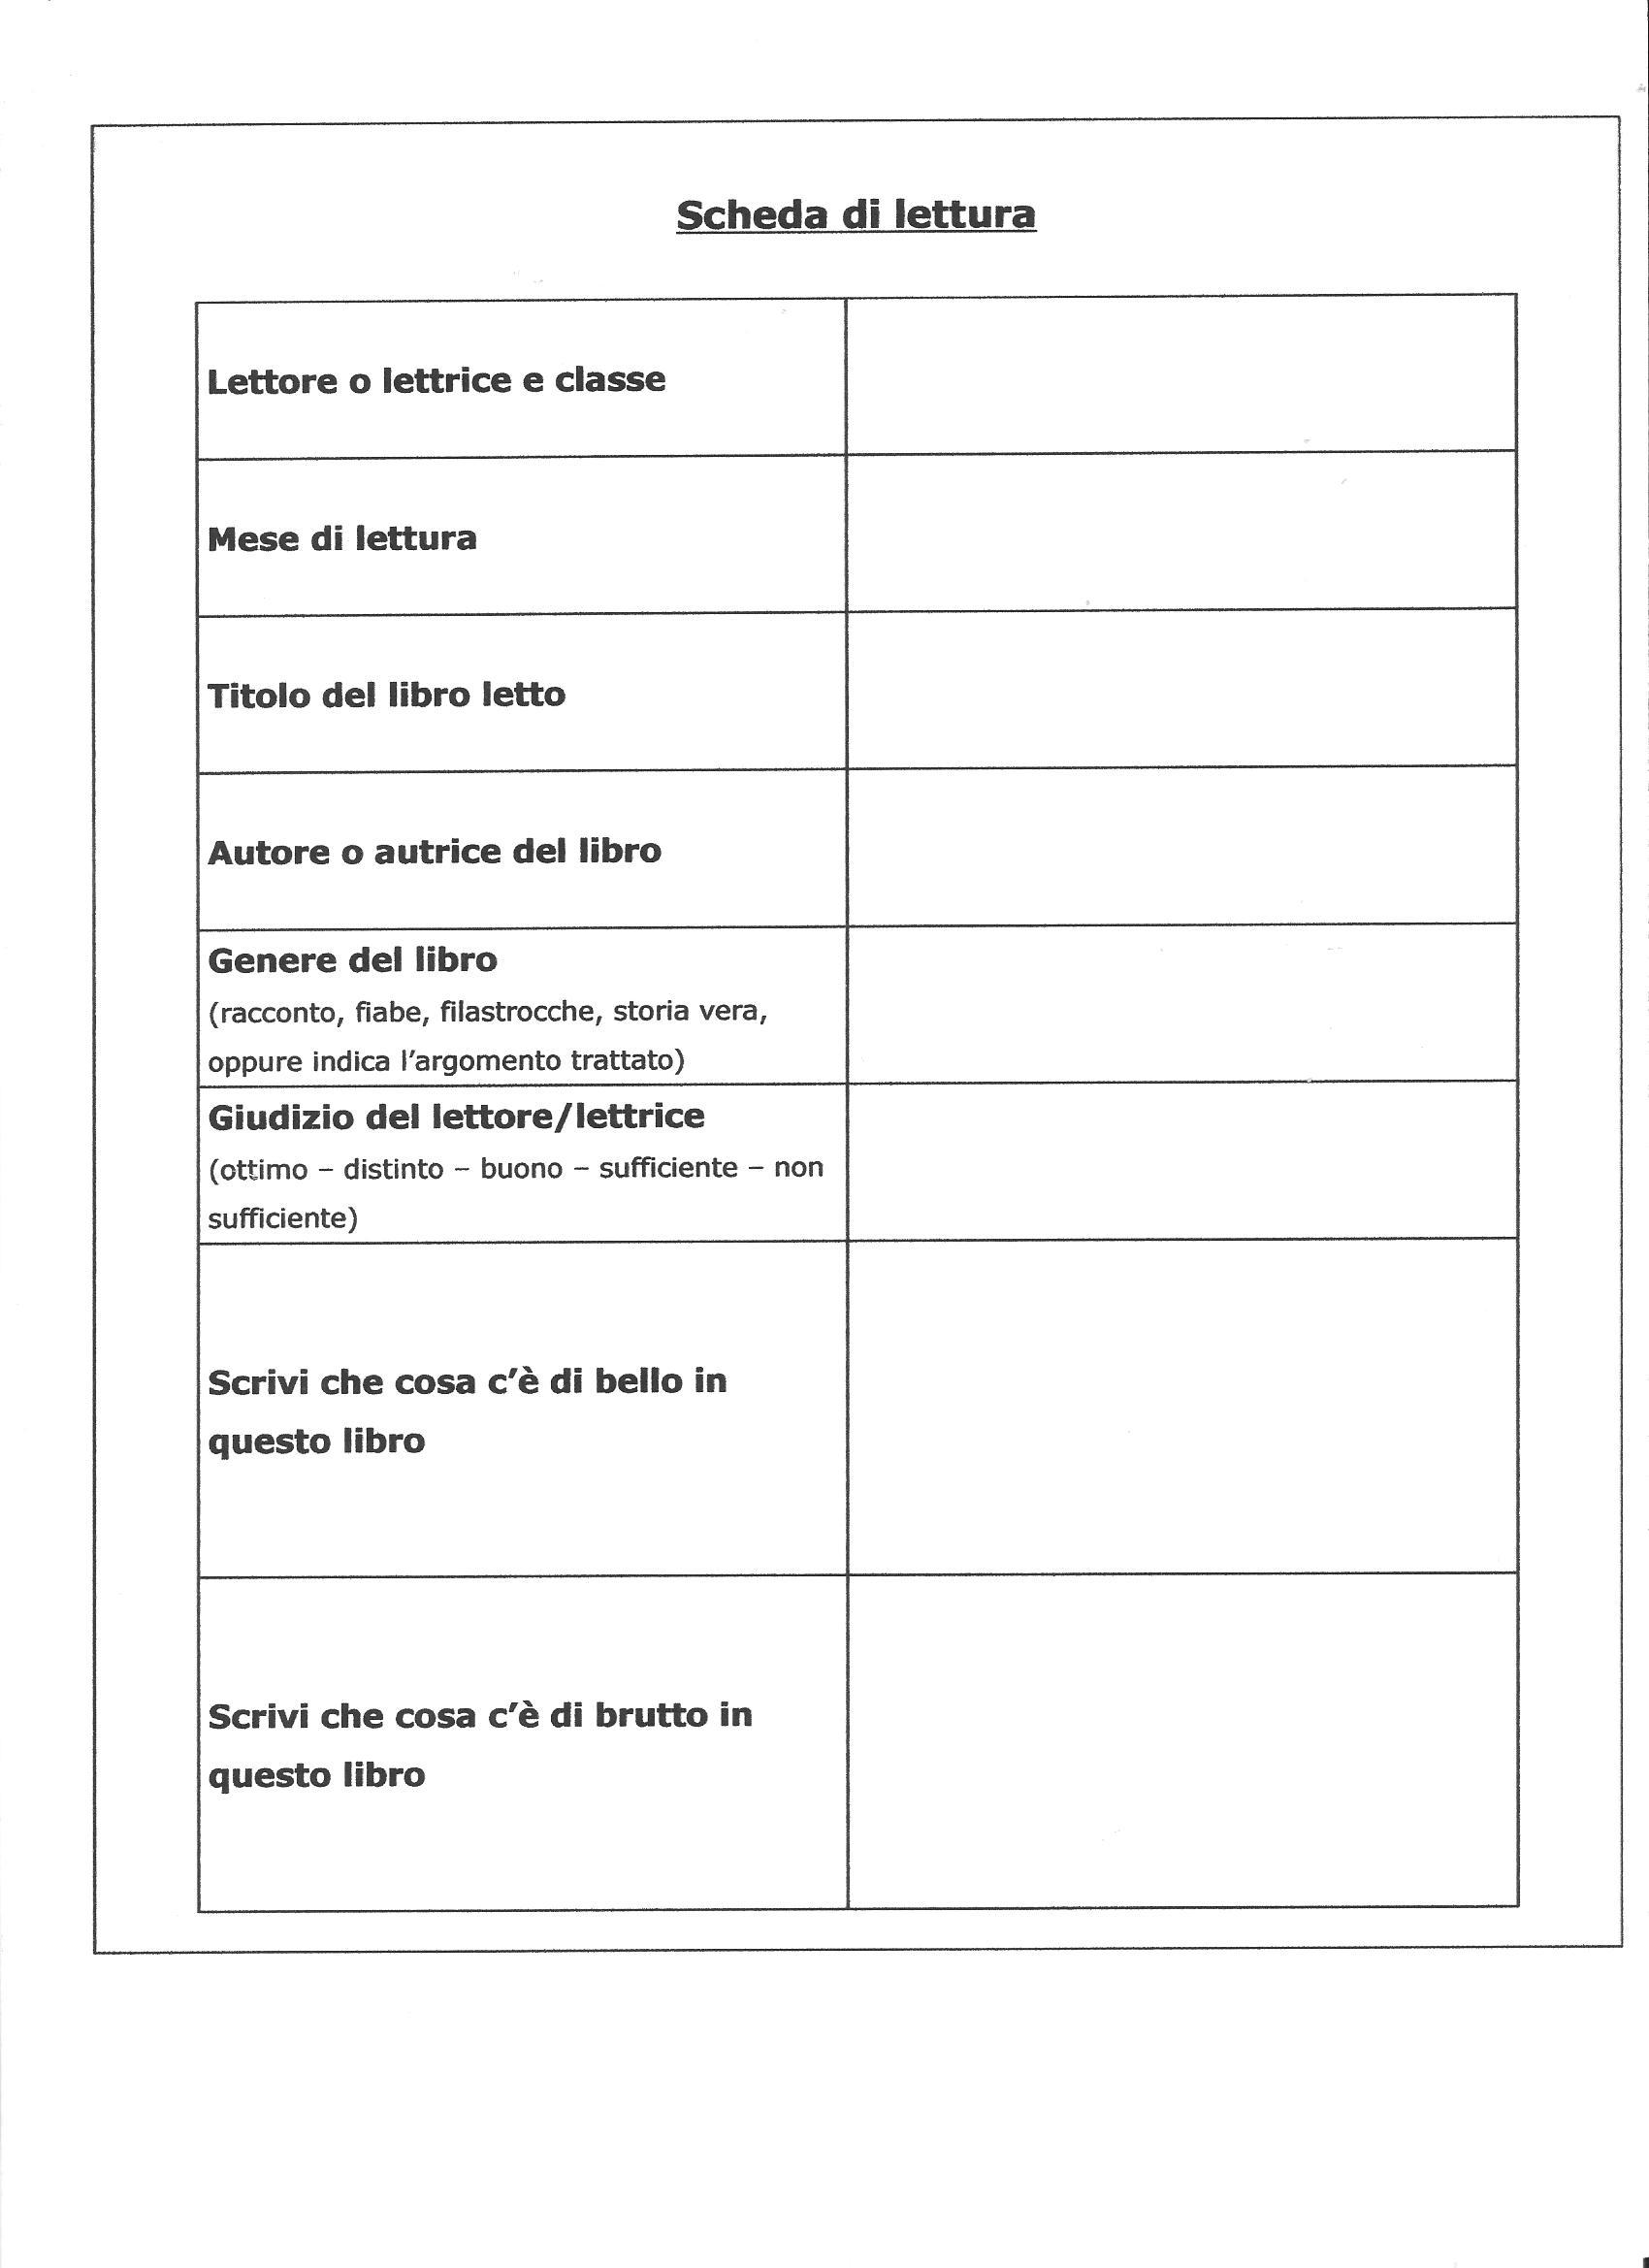 Assez Materiali di studio - unascuola.it UD16